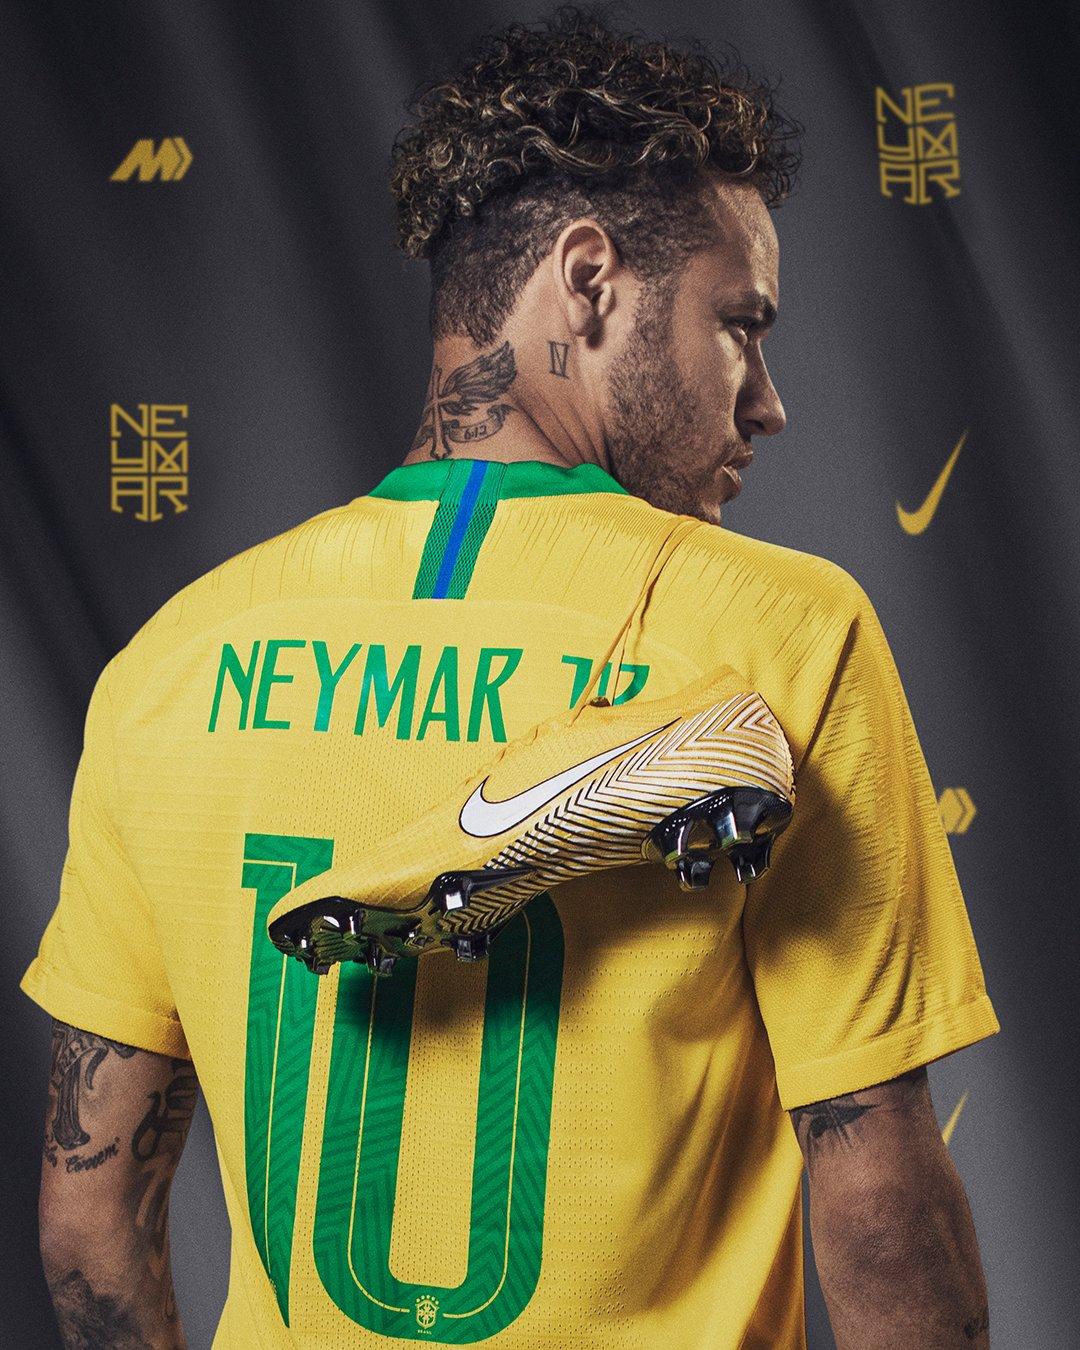 neymar jr instagram profile